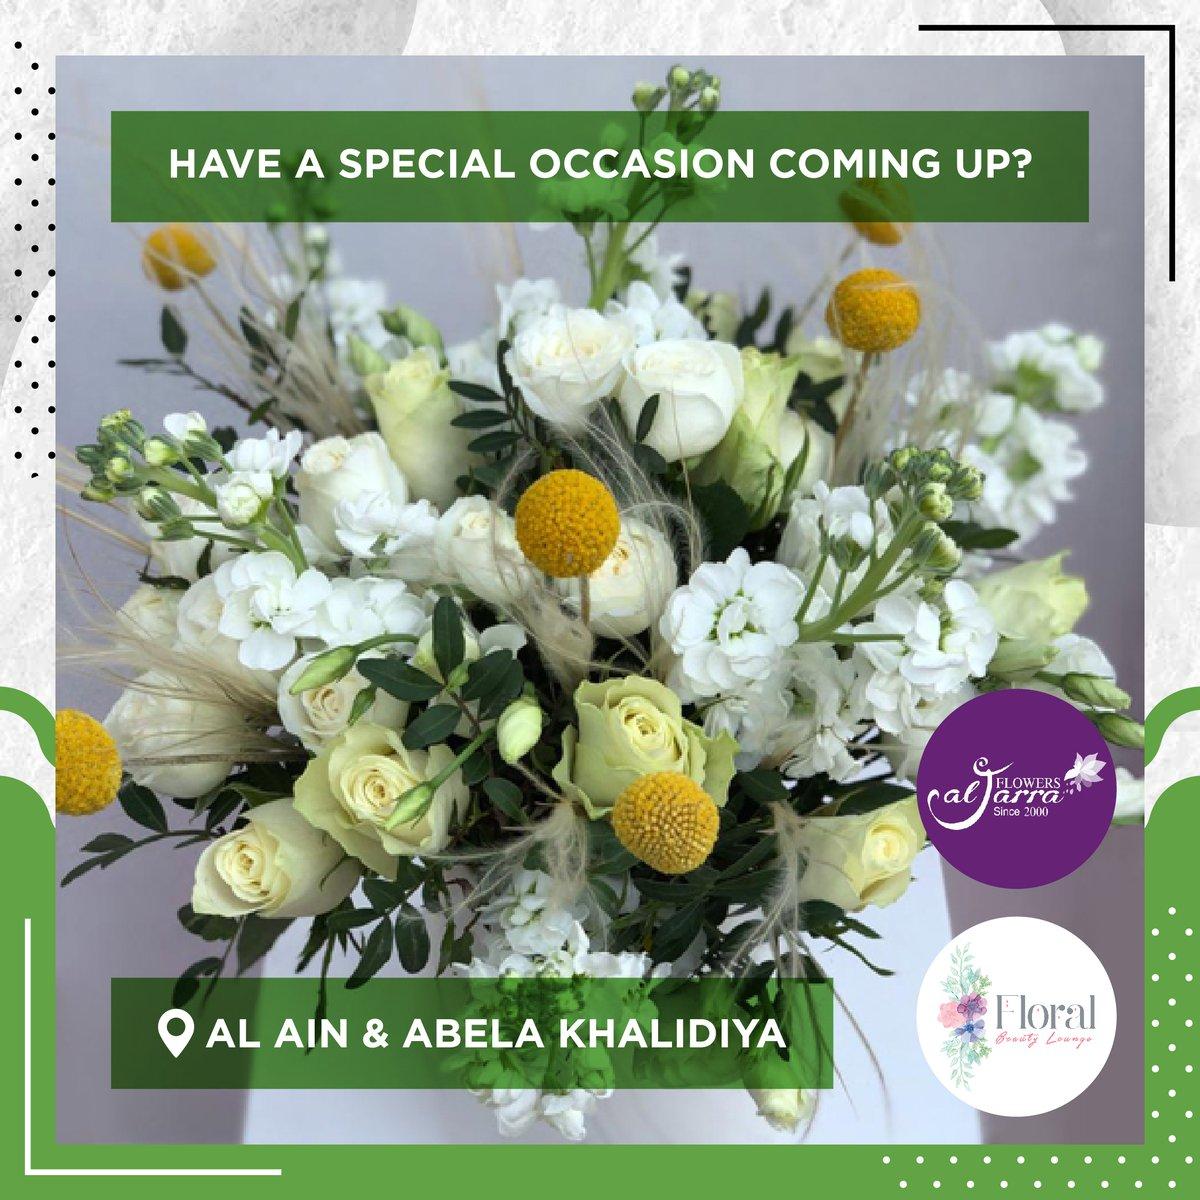 We got you covered! Be sure to check out the flower shops inside Souq Planet Plaza- Al Ain & Abela Plaza, Khalidiya💐😍    #souqplanet #smartshopper #onlineshopping #inabudhabi #dubai #alain #uae #vegan #madinatzayed #safeplanet #stayhome #socialdistancing https://t.co/uxK3w0tt1a